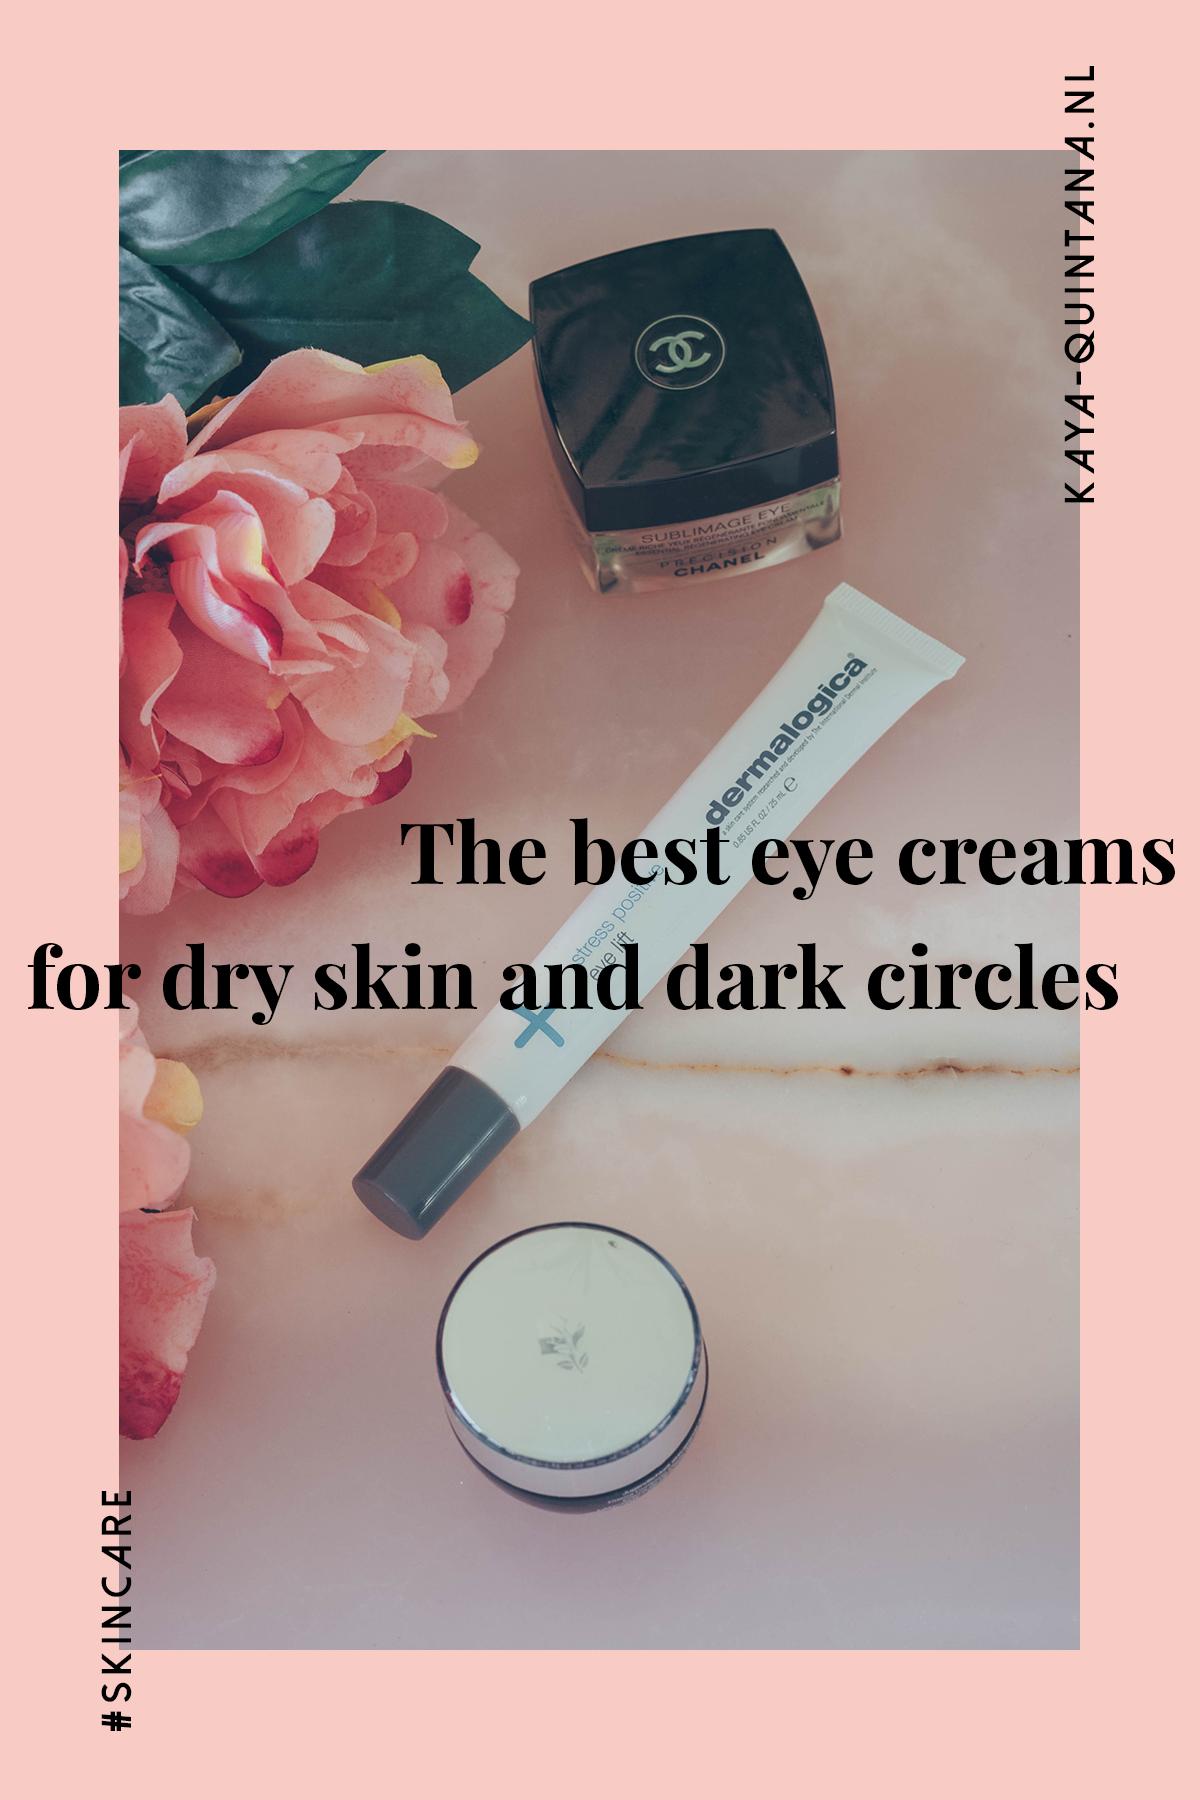 The best eye creams